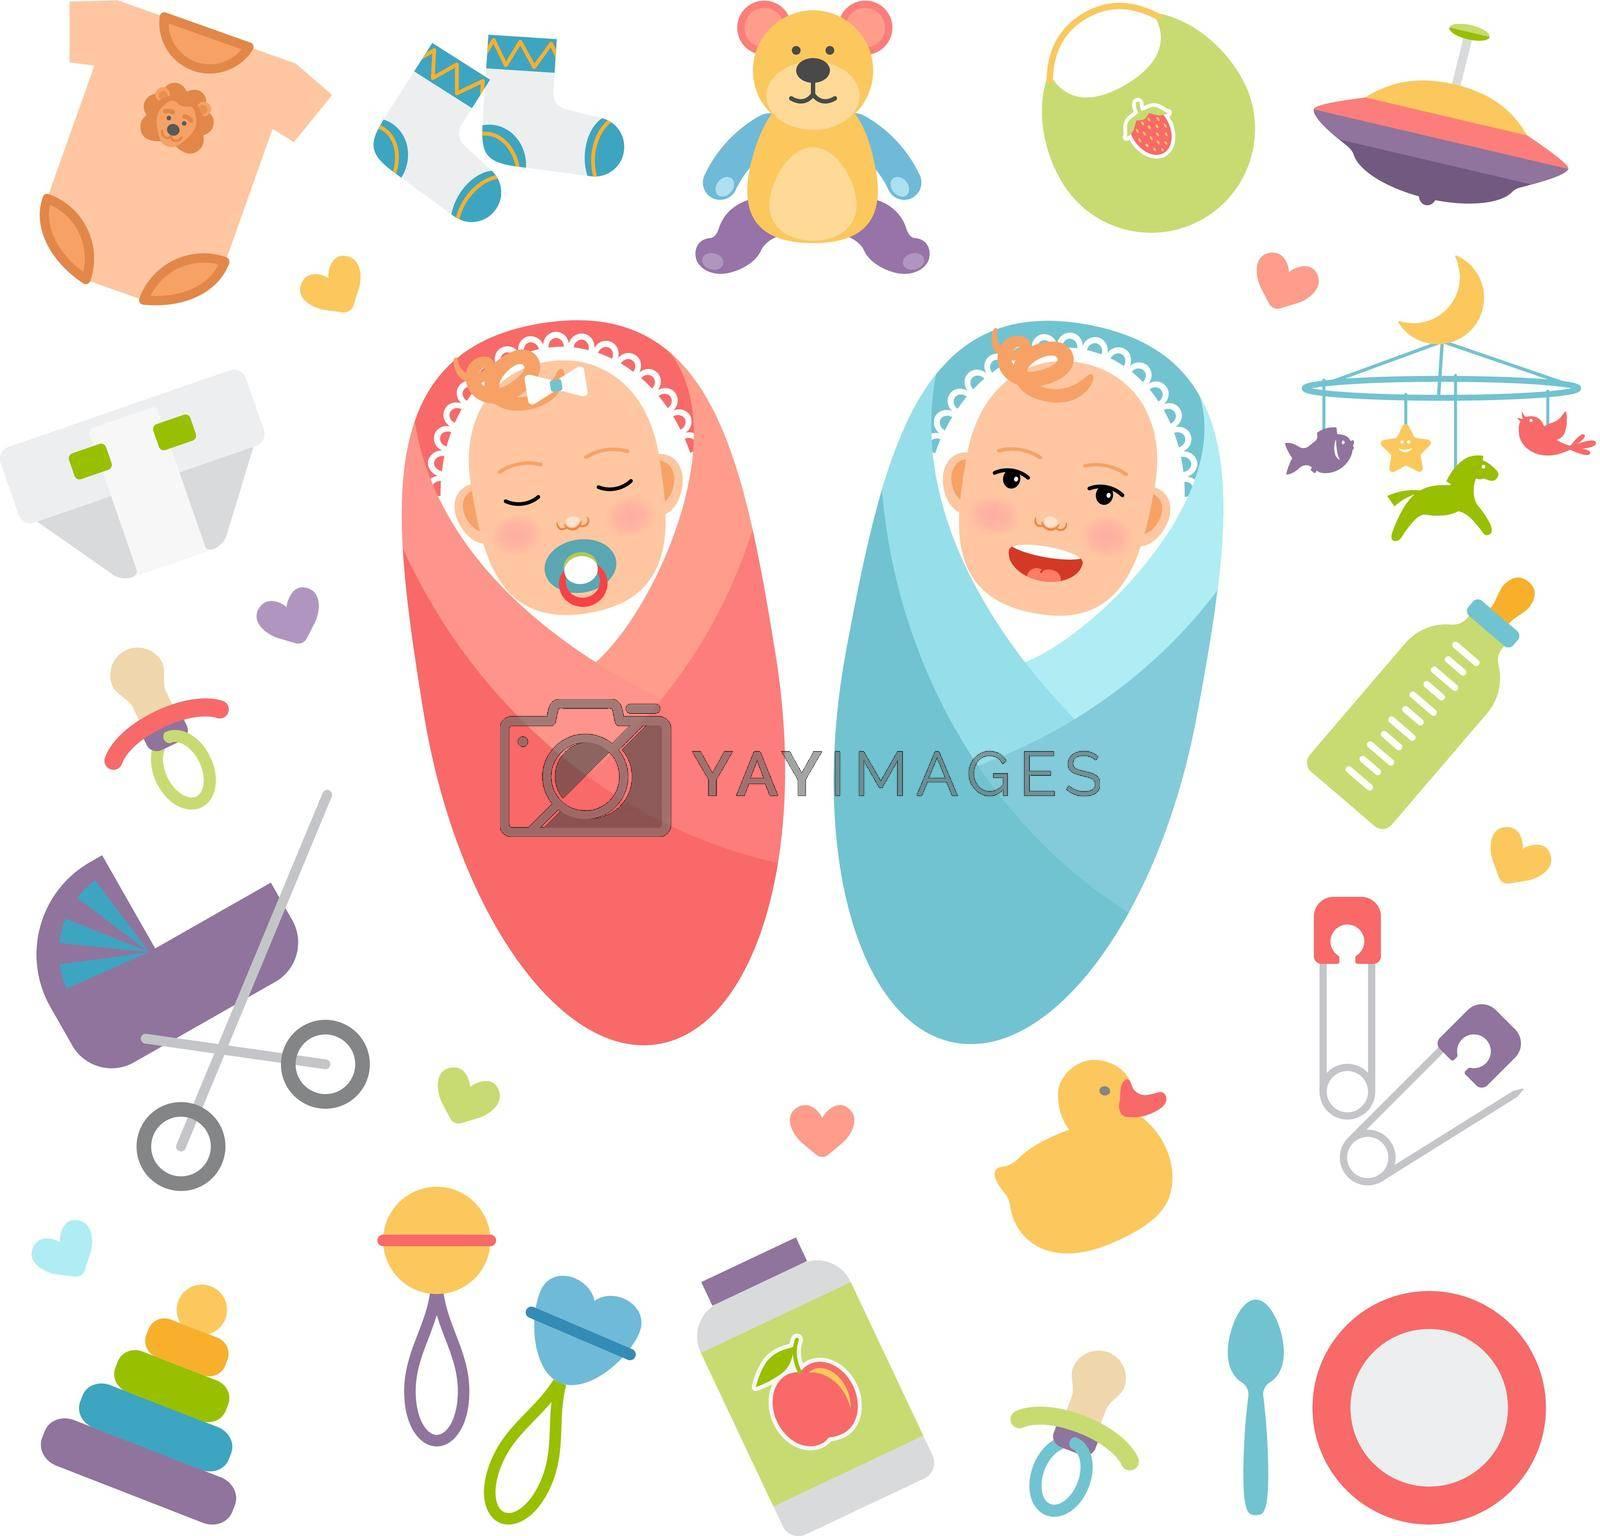 Royalty free image of Vector babies and baby products by mstjahanara